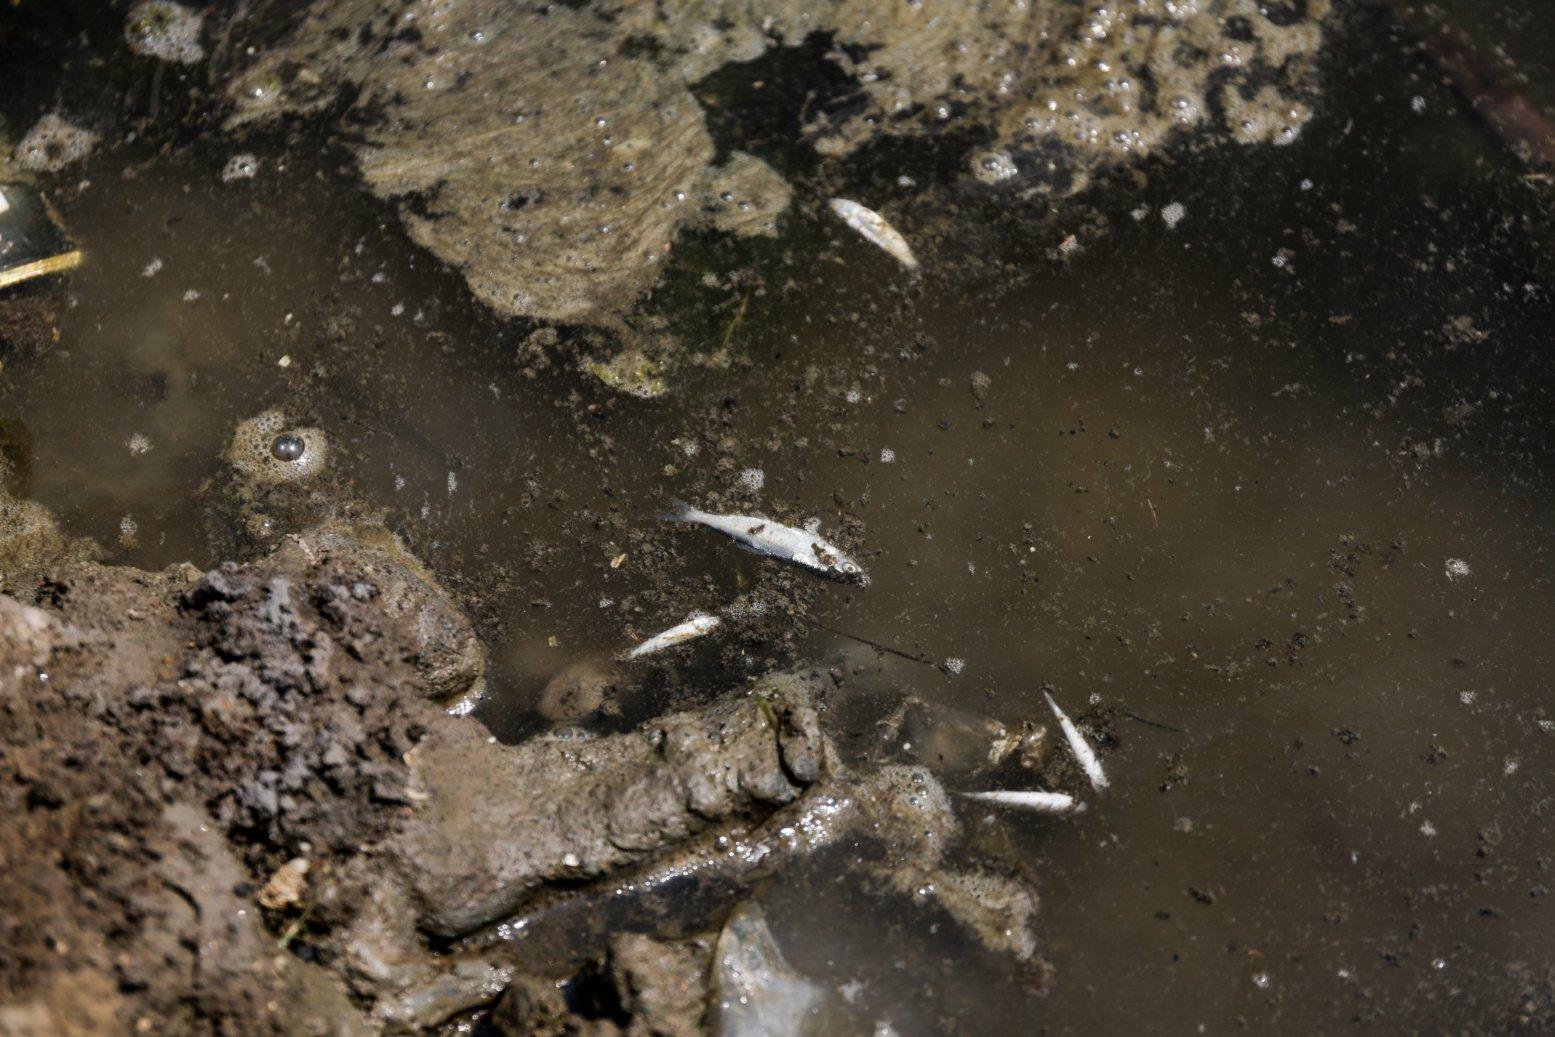 Tampak ikan mati karena efek limbah tumpahan minyak Oil Spill yang tercecer milik Pertamina di Tambak, Cemarajaya, Karawang, Jawa Barat, Jumat (24/7/2019). Pasir yang tercemar minyak tersebut dikumpulkan dan akan dipindahkan ke pabrik penyimpanan limbah B3 (Bahan Berbahaya dan Beracun) untuk dimusnahkan.